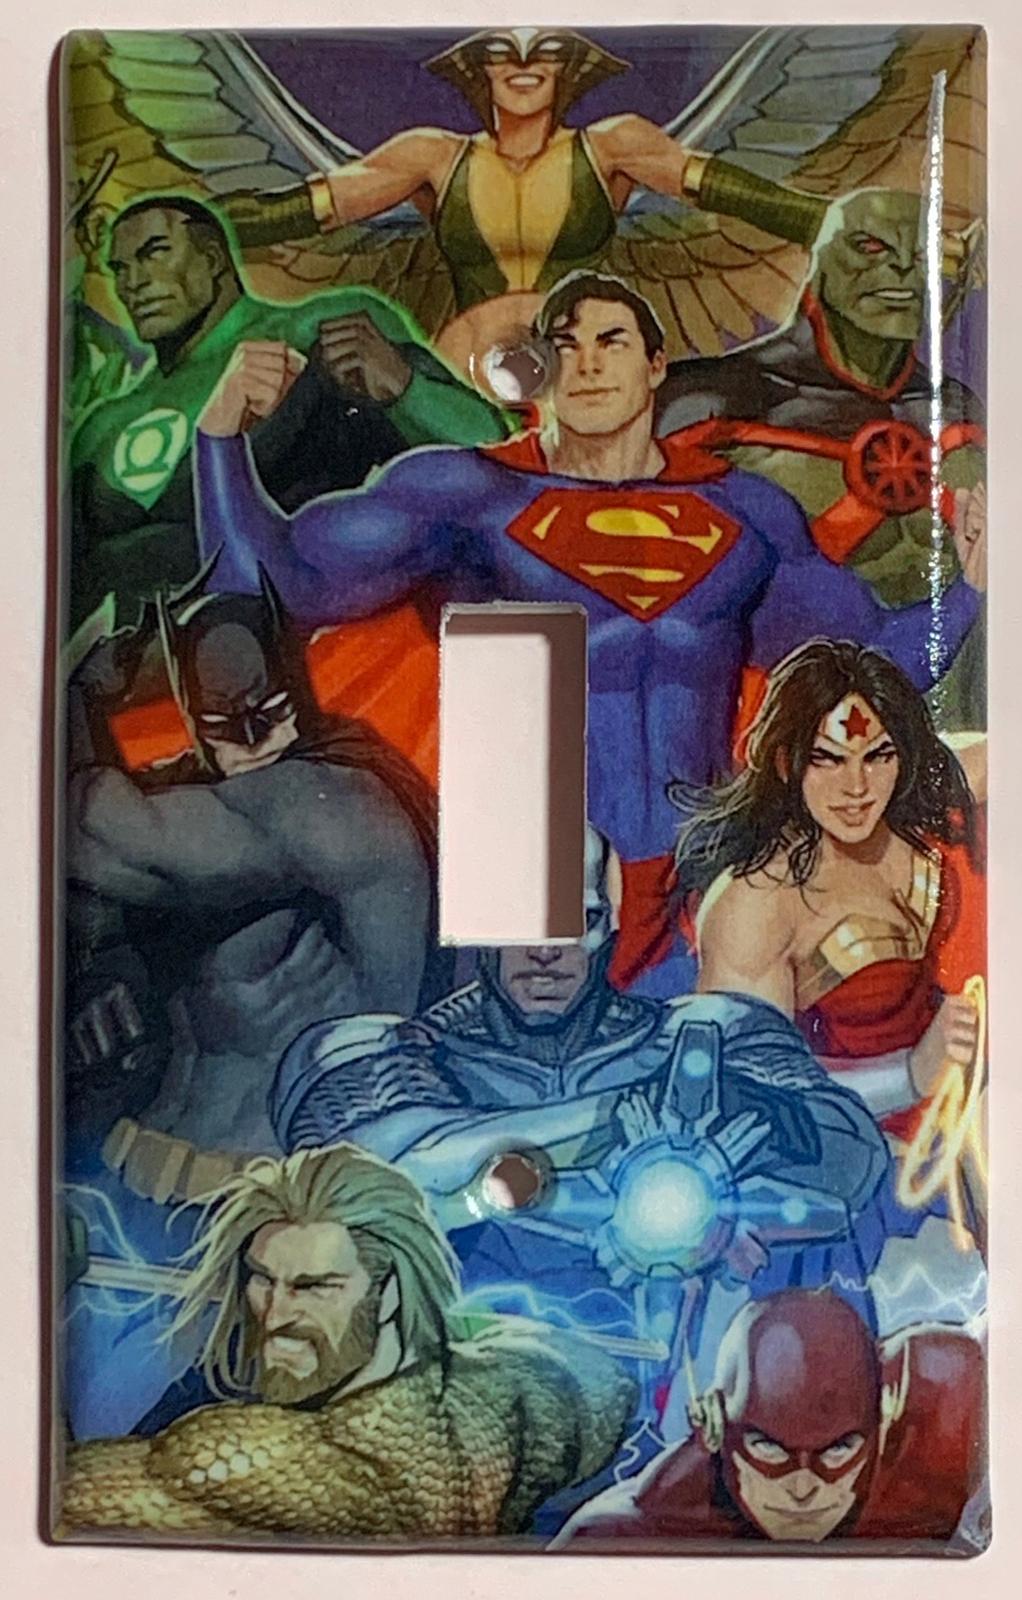 Dc super heroes toggle single